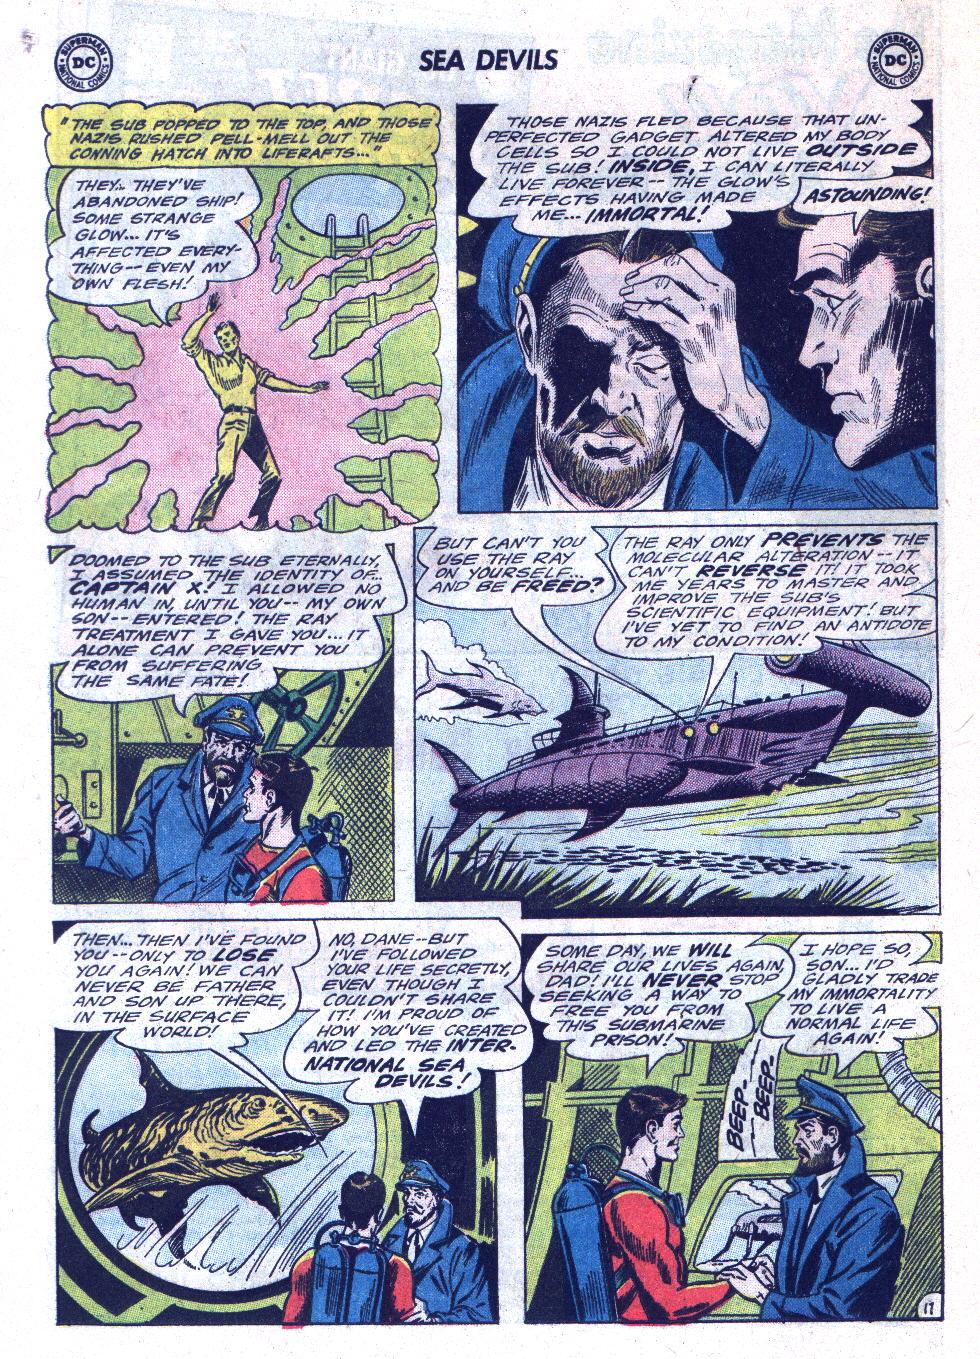 Read online Sea Devils comic -  Issue #22 - 24